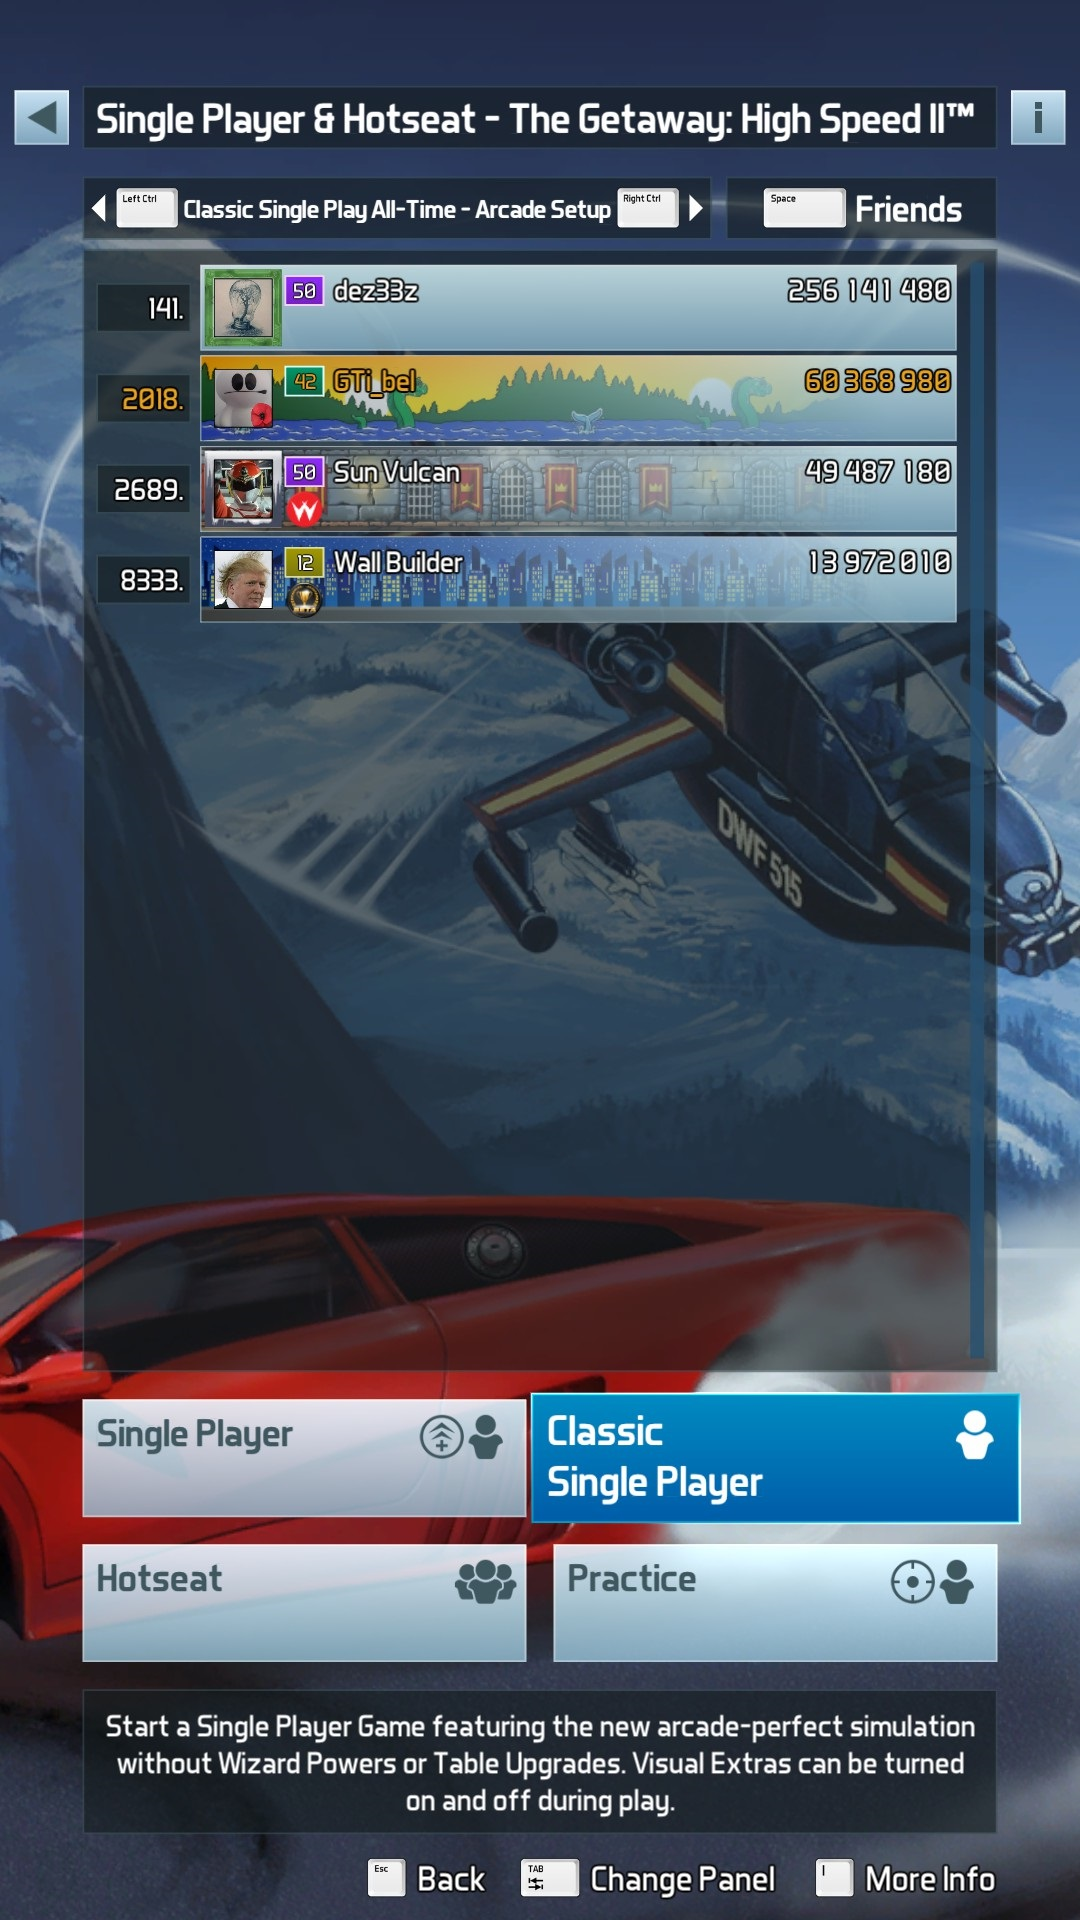 GTibel: Pinball FX3: The Getaway: High Speed II [Arcade] (PC) 60,368,980 points on 2020-01-15 10:57:41